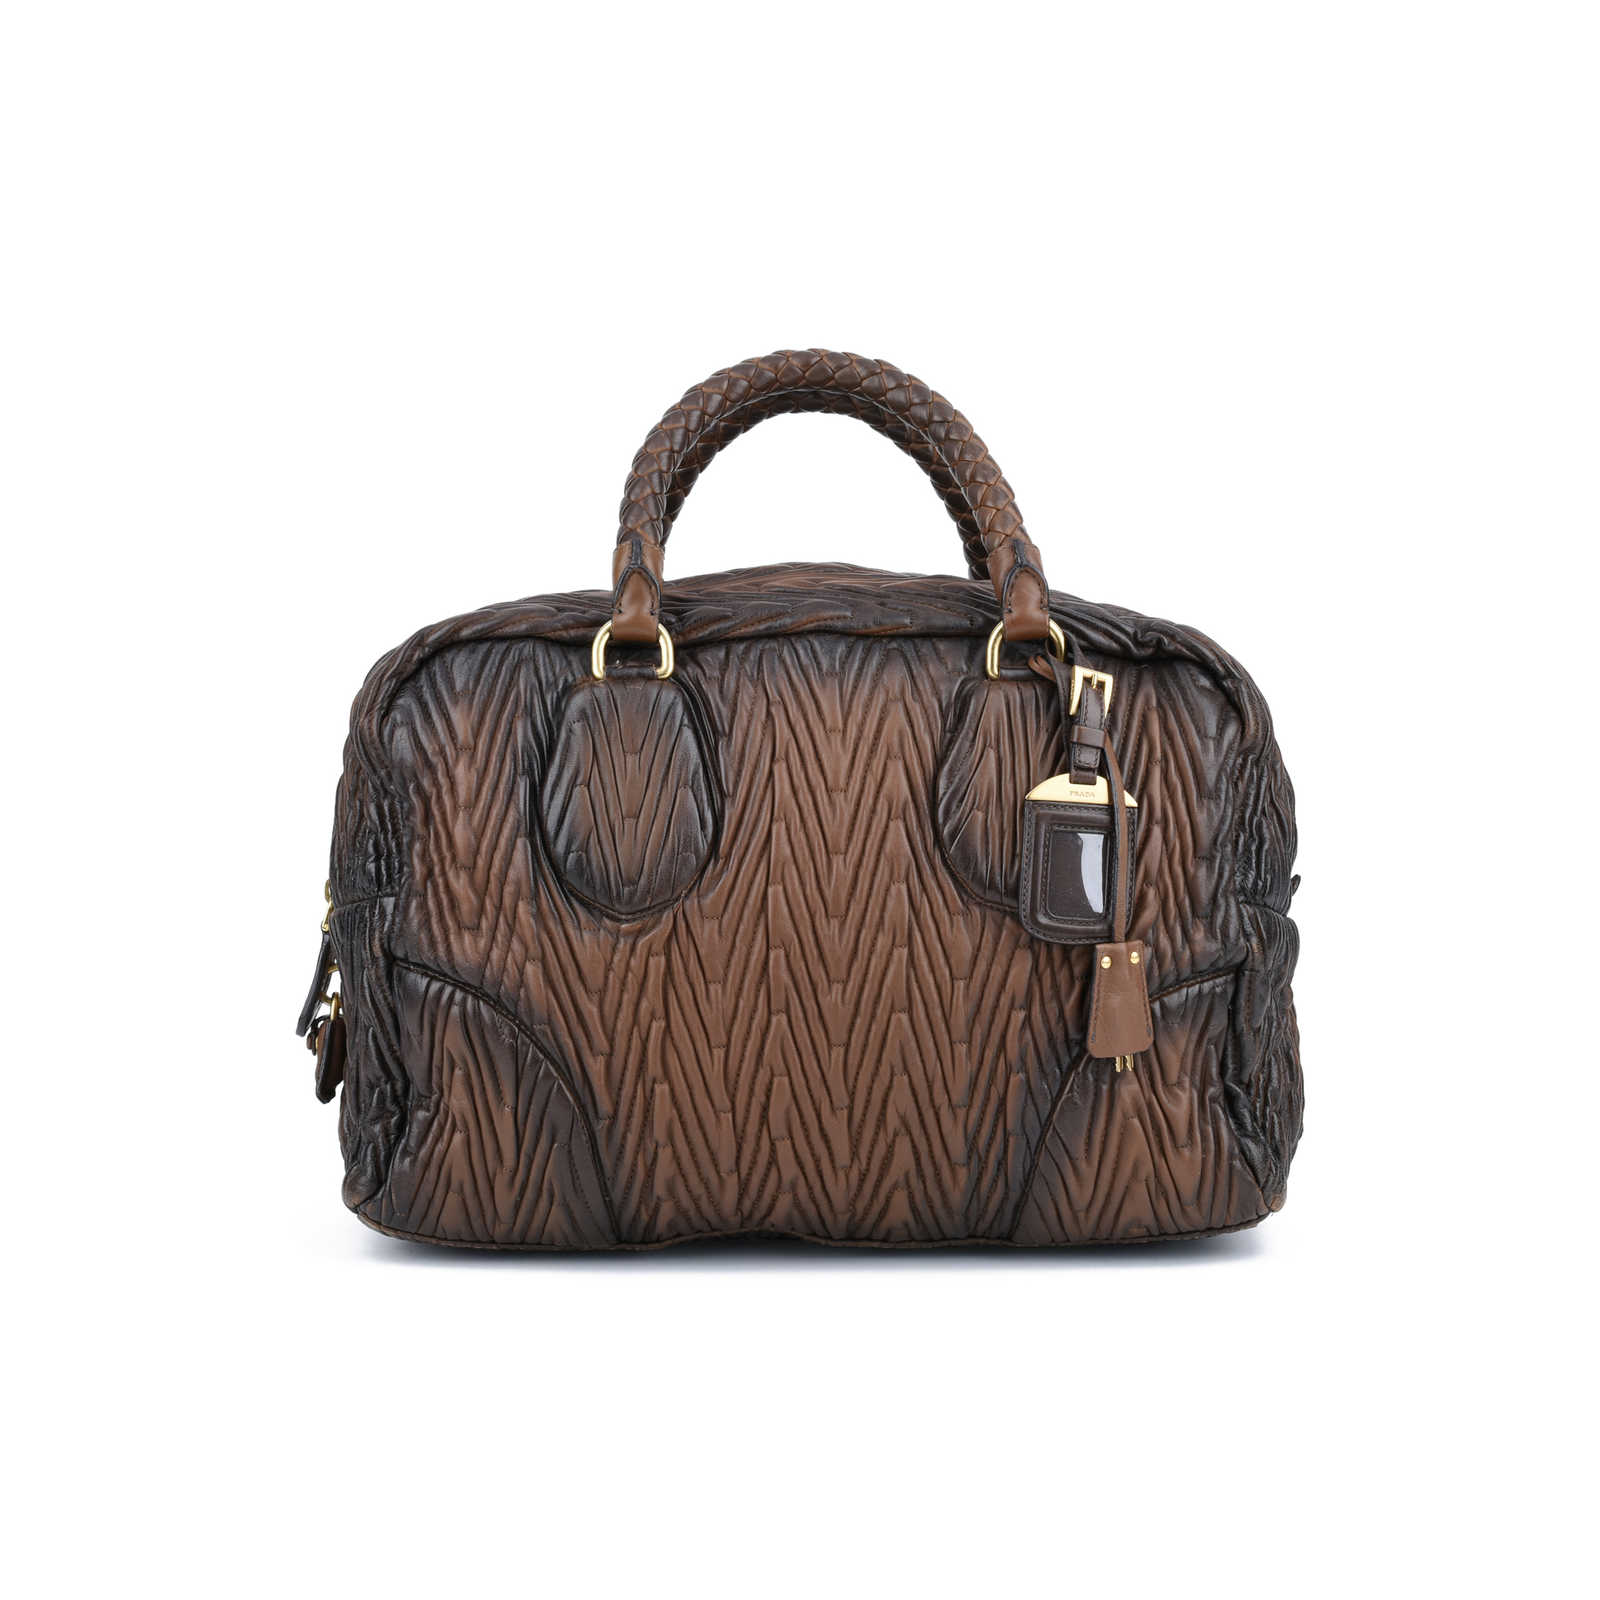 ... low price authentic pre owned prada nappa chevron handle bag pss 420  00036 3759e fe34b d511f59e8da6b